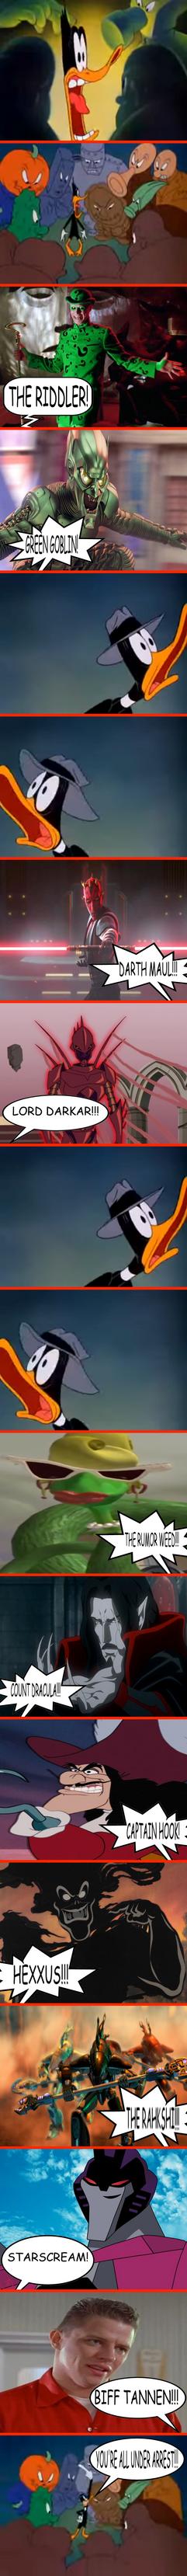 Duck Twacy vs 11 random favourite villains 2